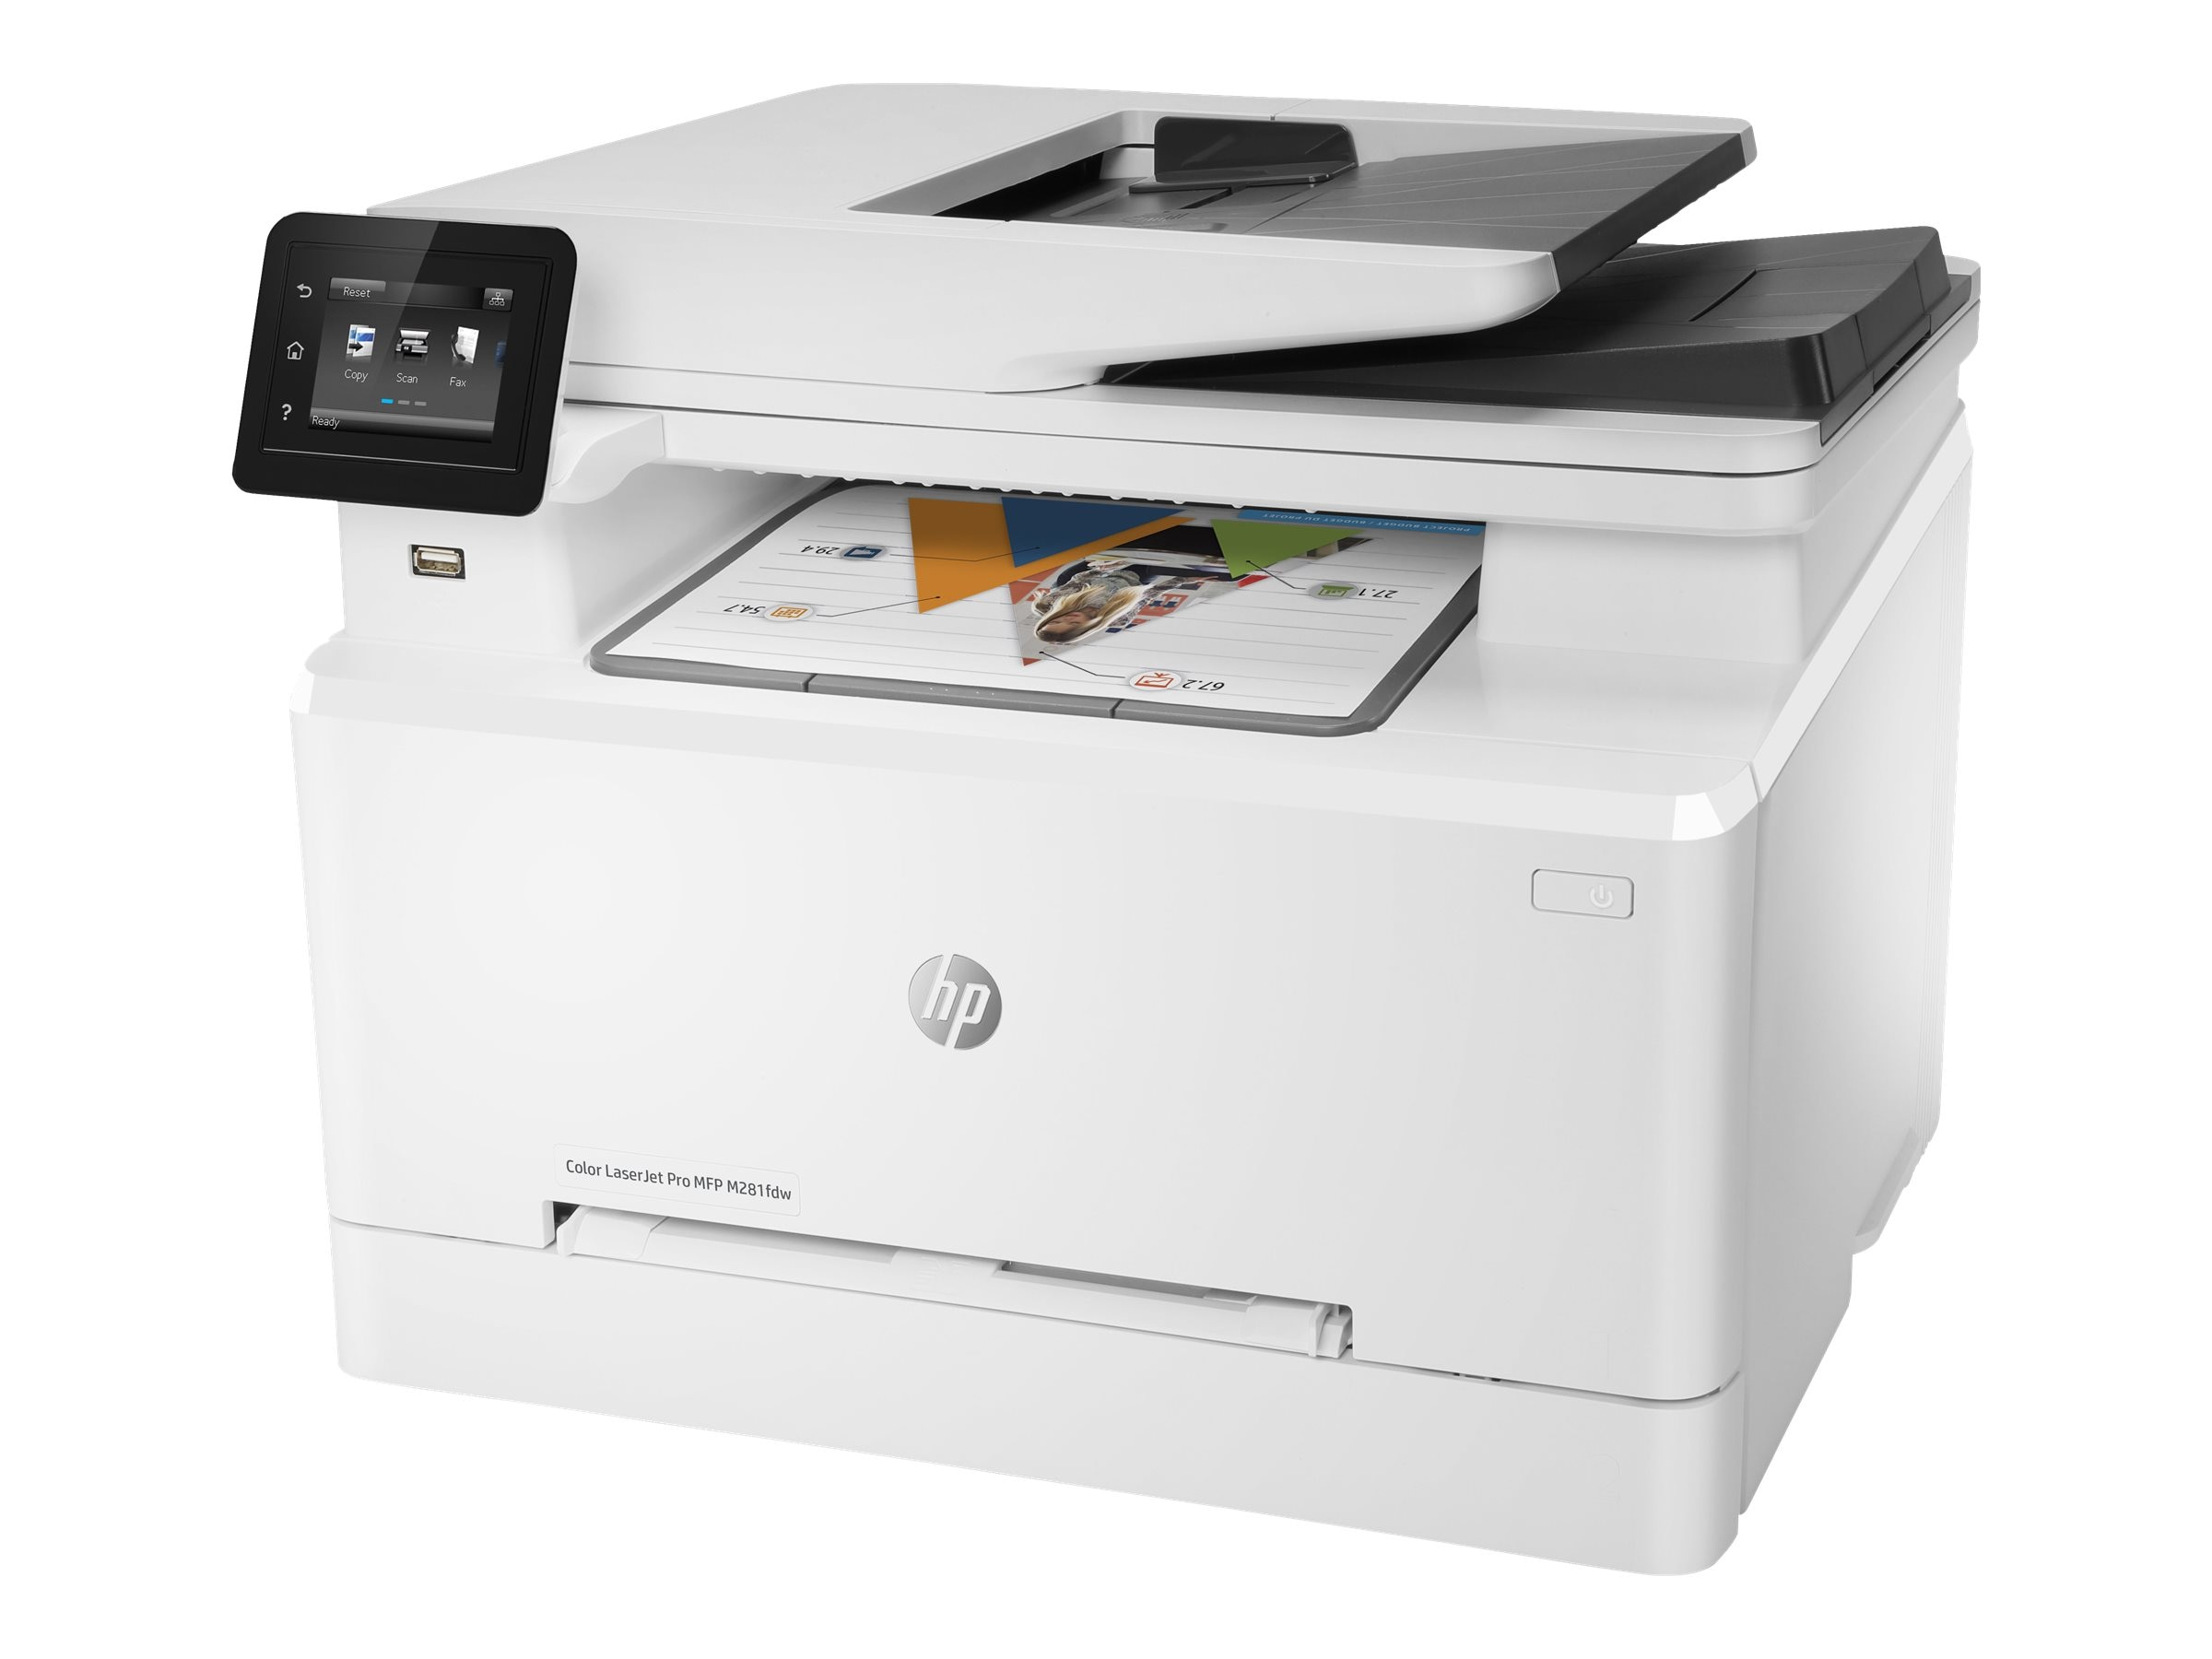 HP Color LaserJet Pro MFP M281fdw (T6B82A#BGJ)